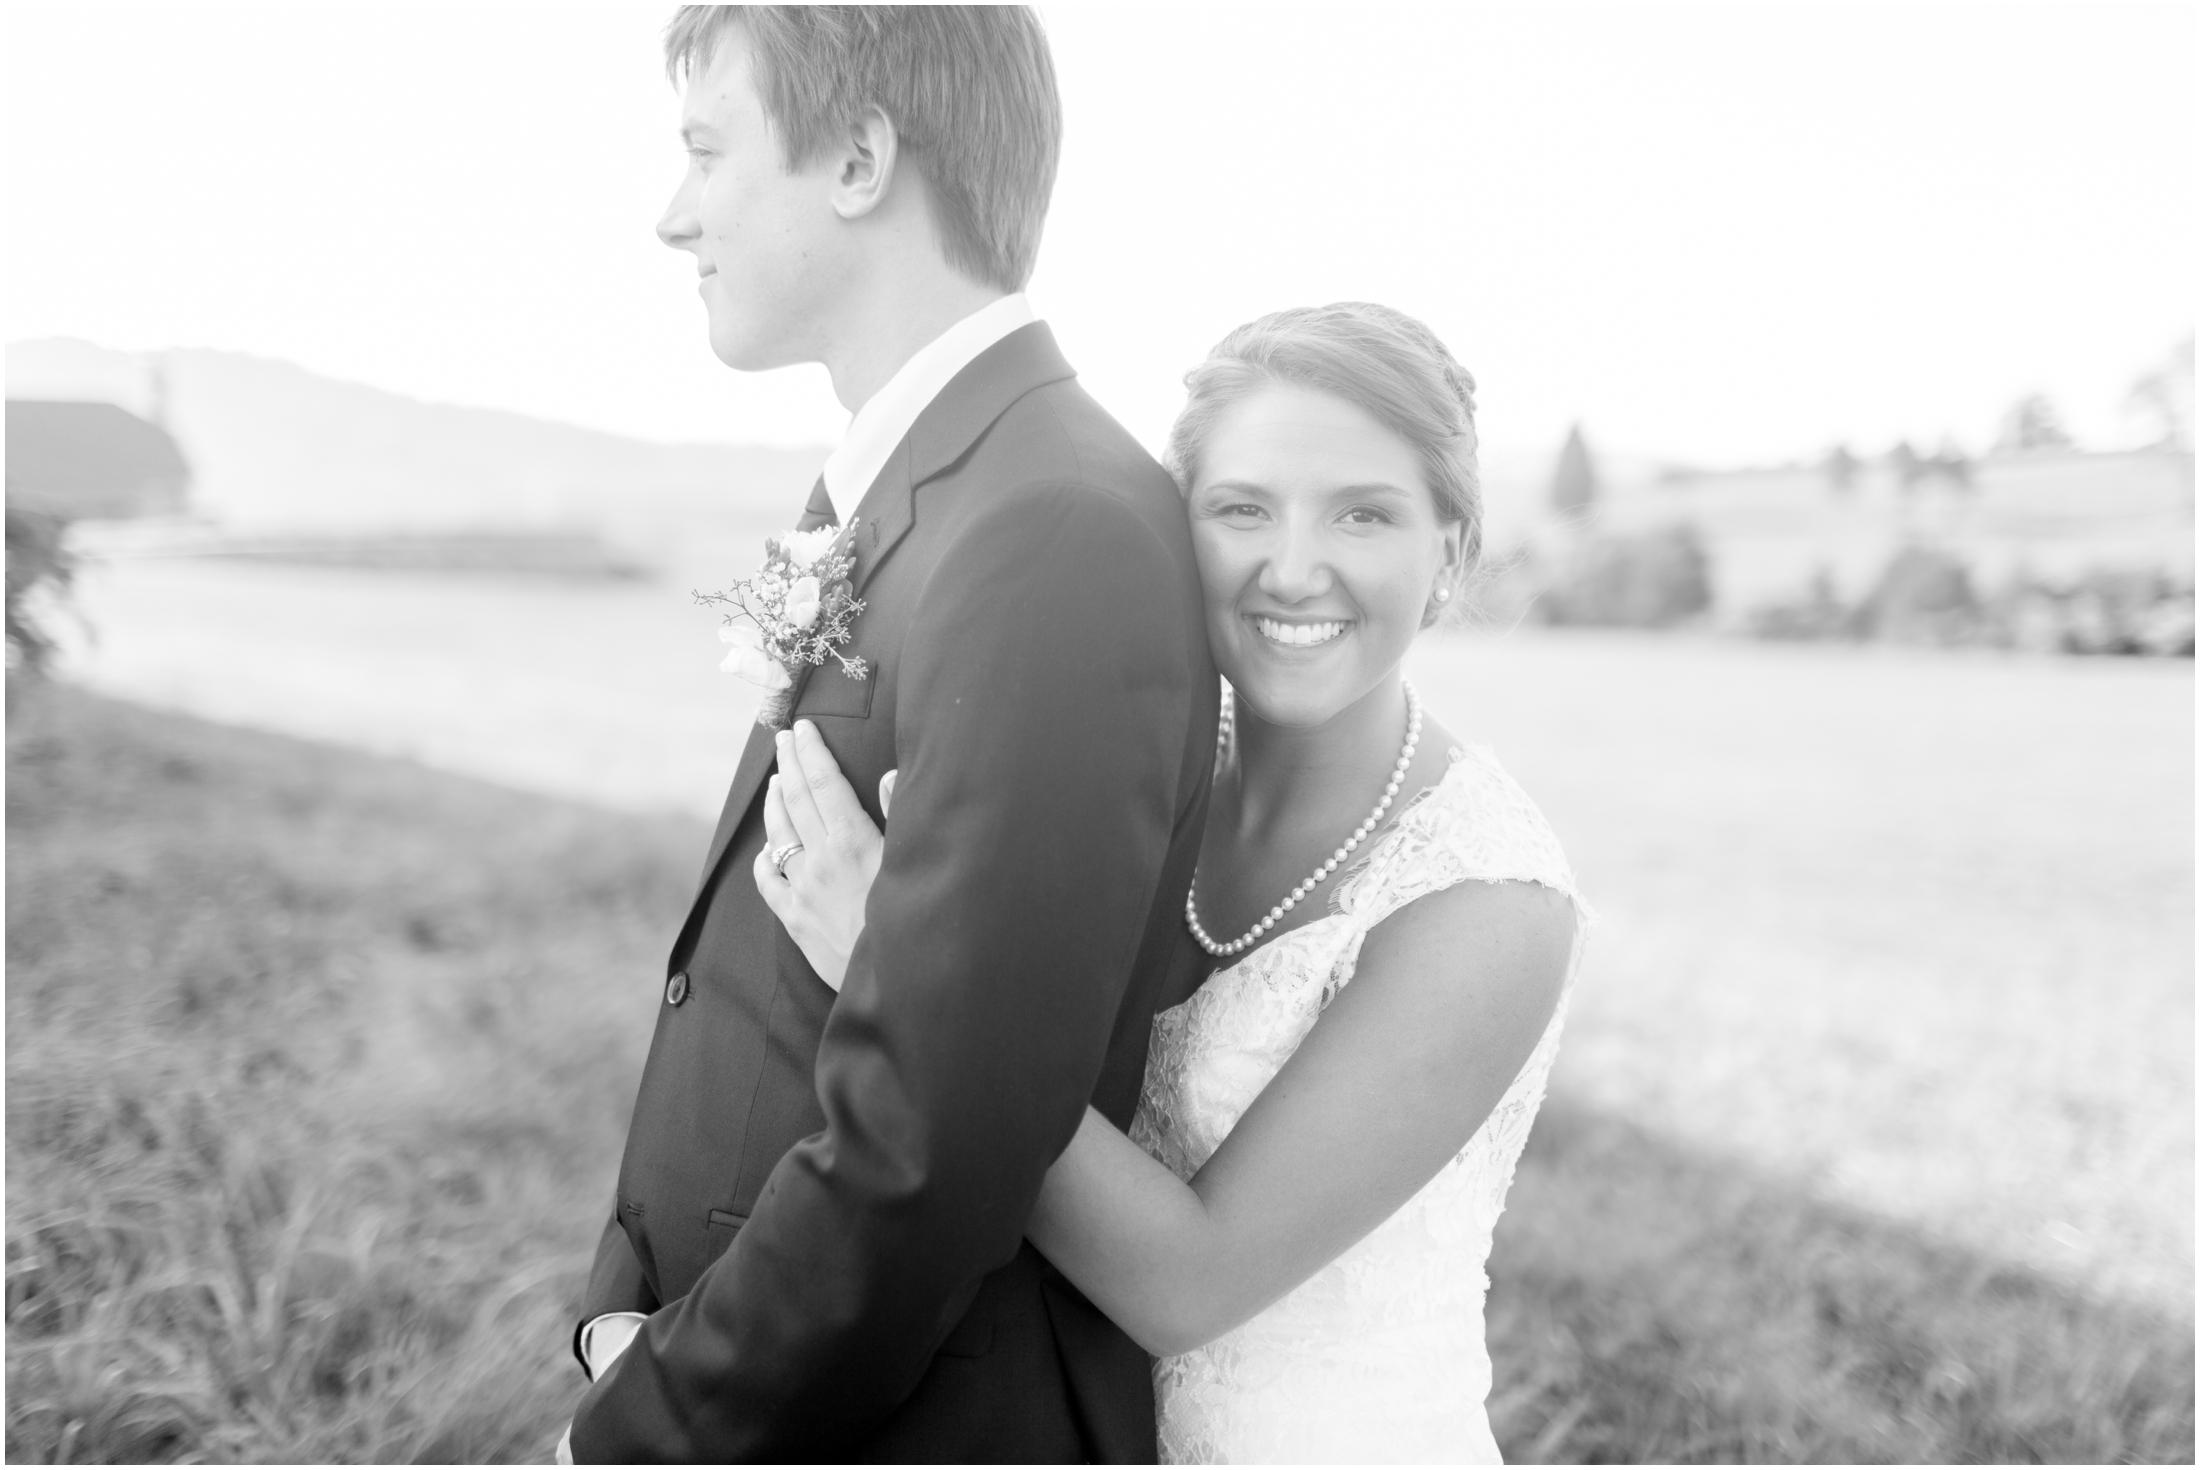 Norton-Wedding-3-Bride-and-Groom-Portraits-1011.jpg